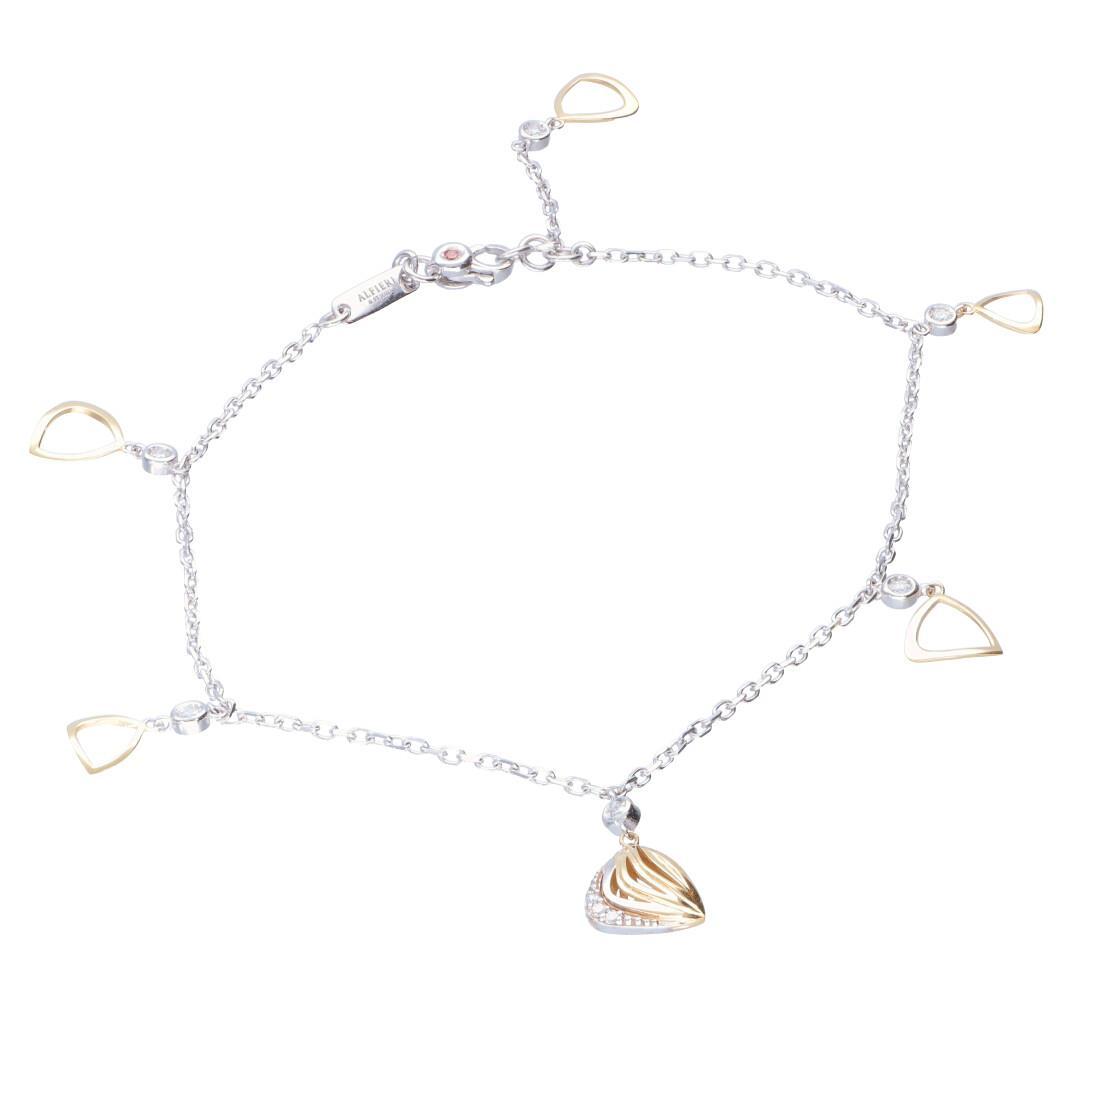 Bracelet with diamonds - ALFIERI & ST. JOHN